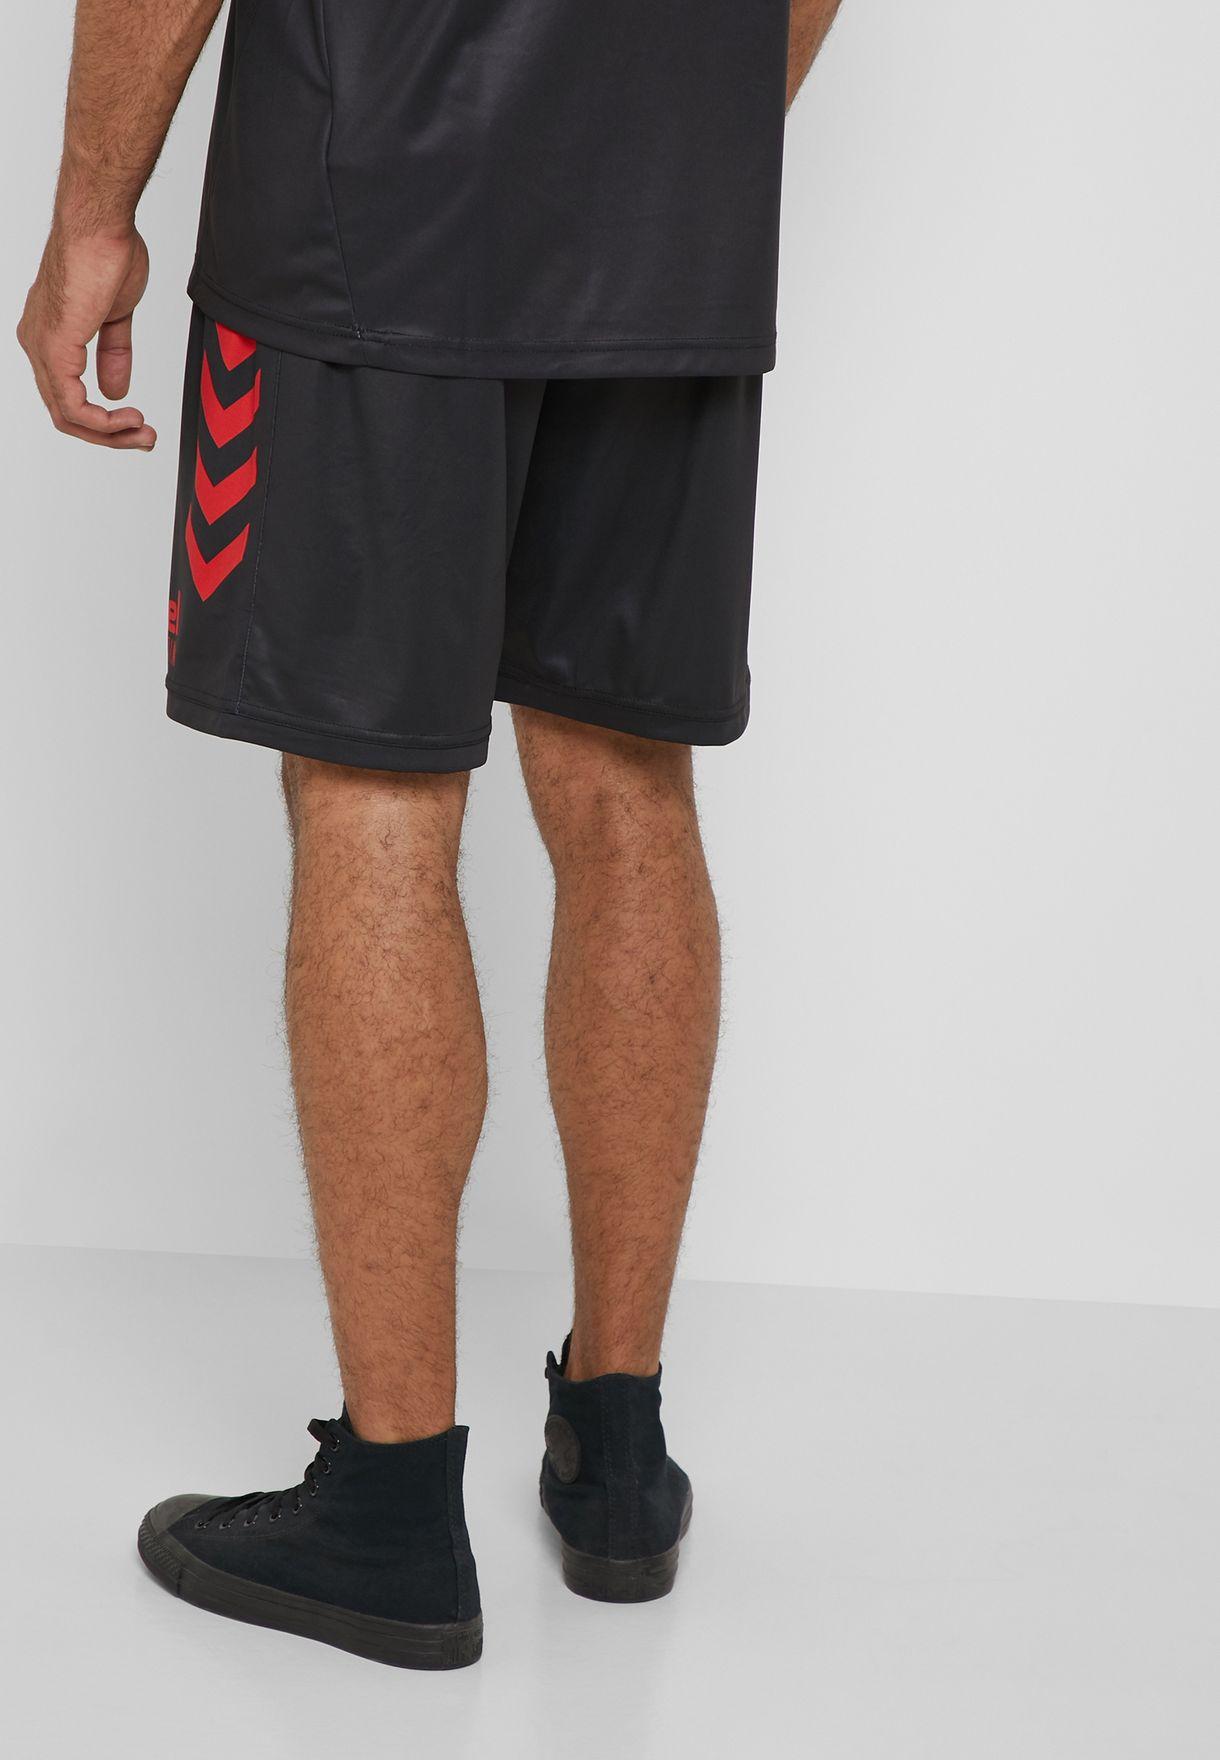 Hummel X Willy Chavarria Mortensen shorts